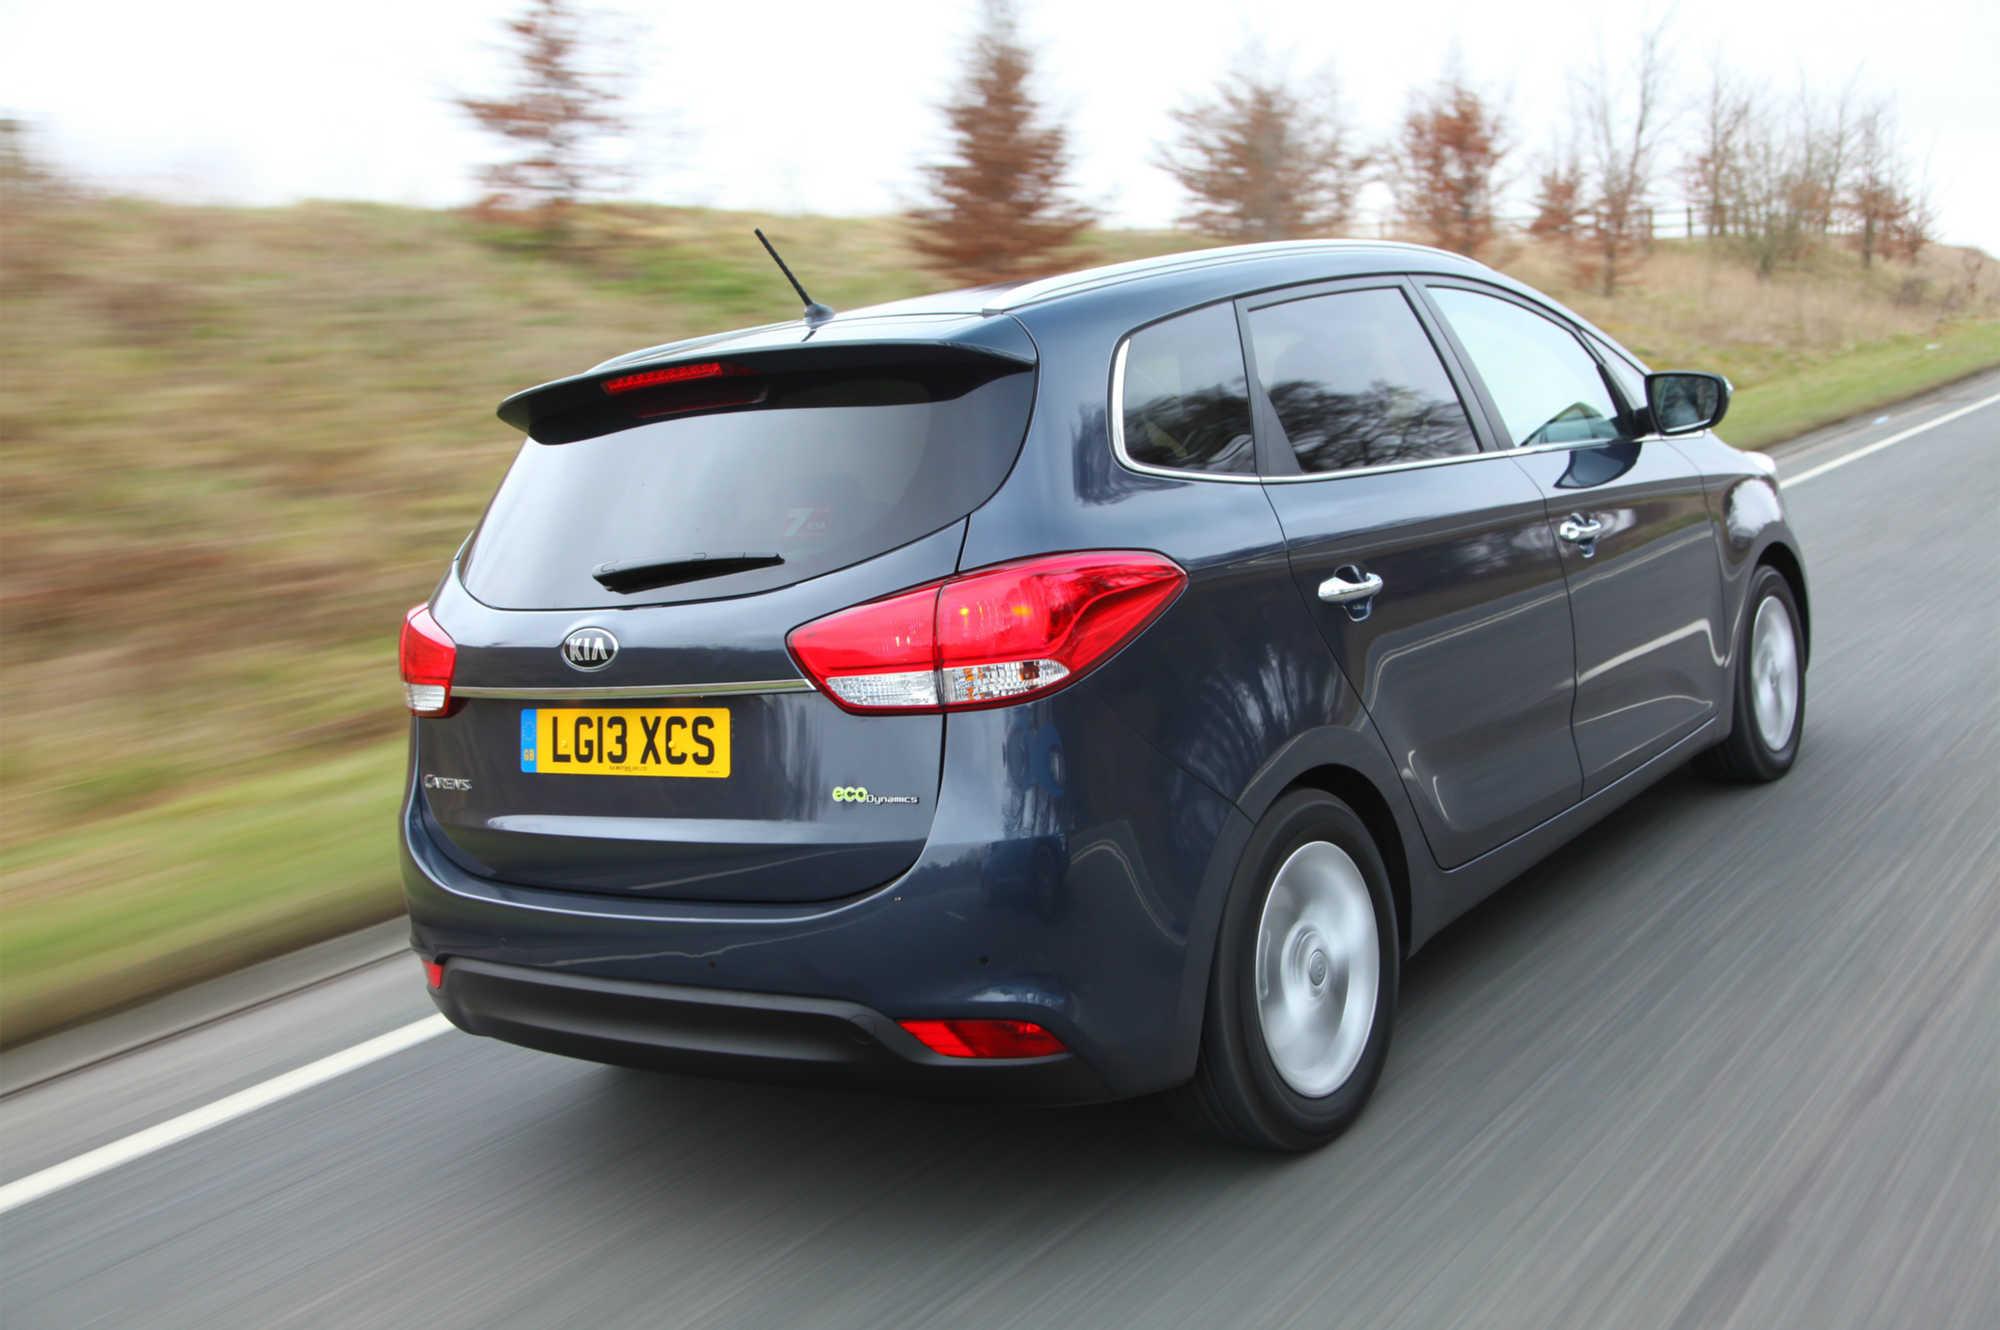 Kia Carens MPV review - Car Keys